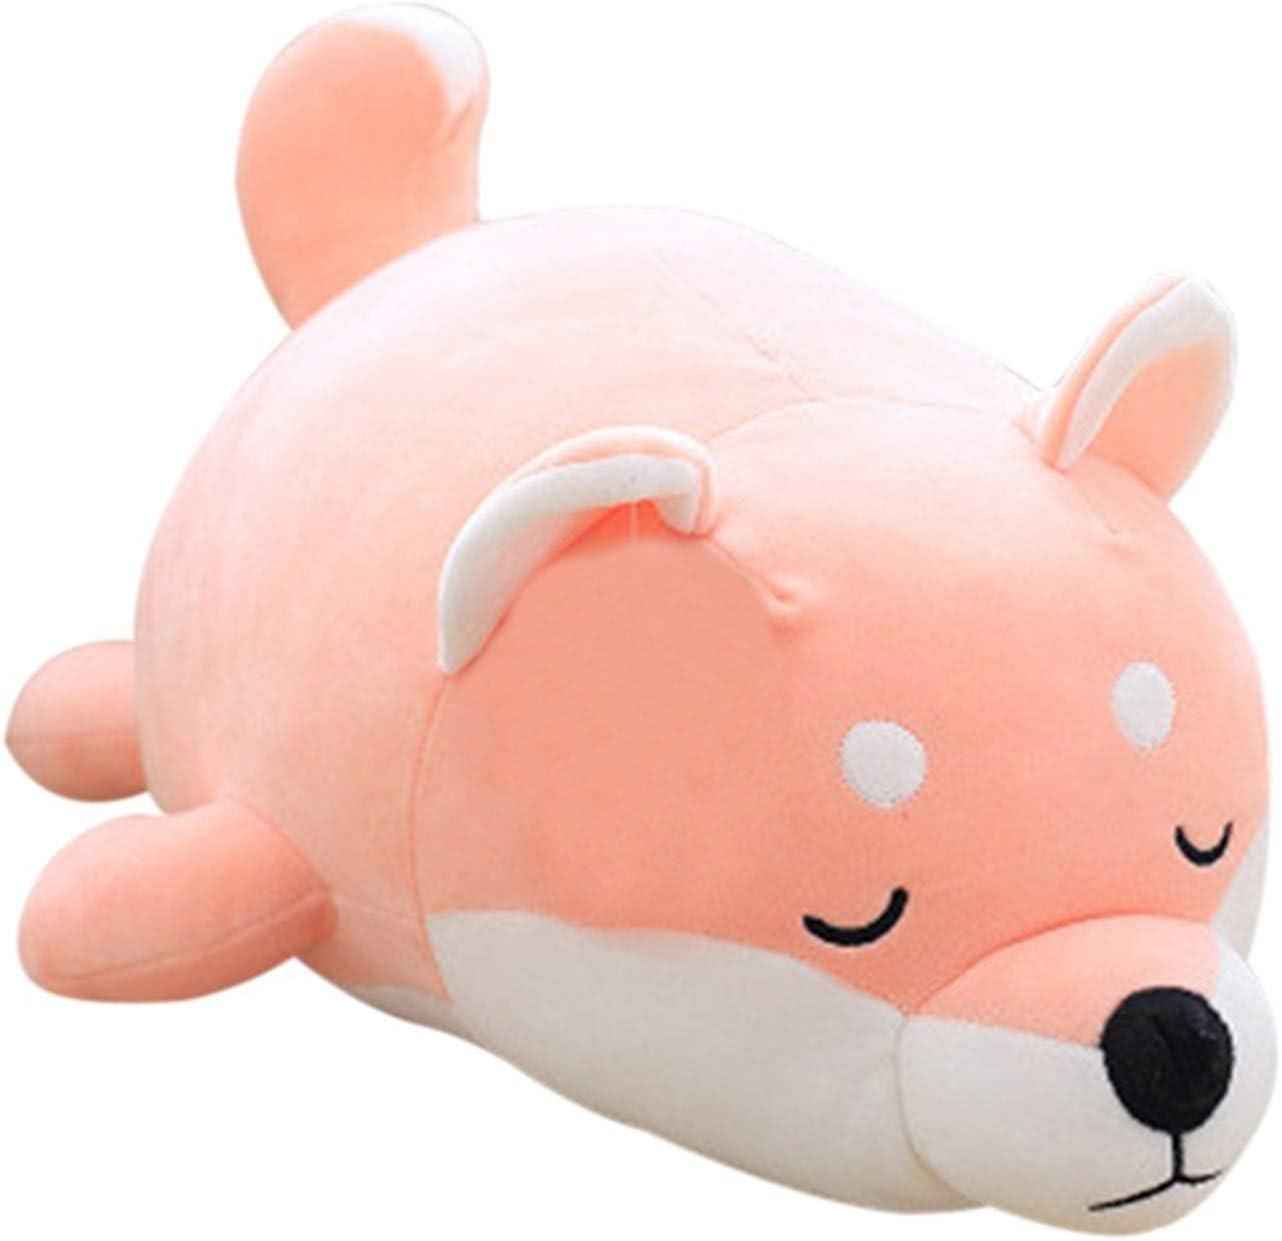 Molizhi Cute Plushies Stuffed Animal Shiba Inu Plush Toy Anime Hugging Pillow Corgi Kawaii Soft Dog Pillow Gift for Kids Boys Girls Adults (Pink, 14'')